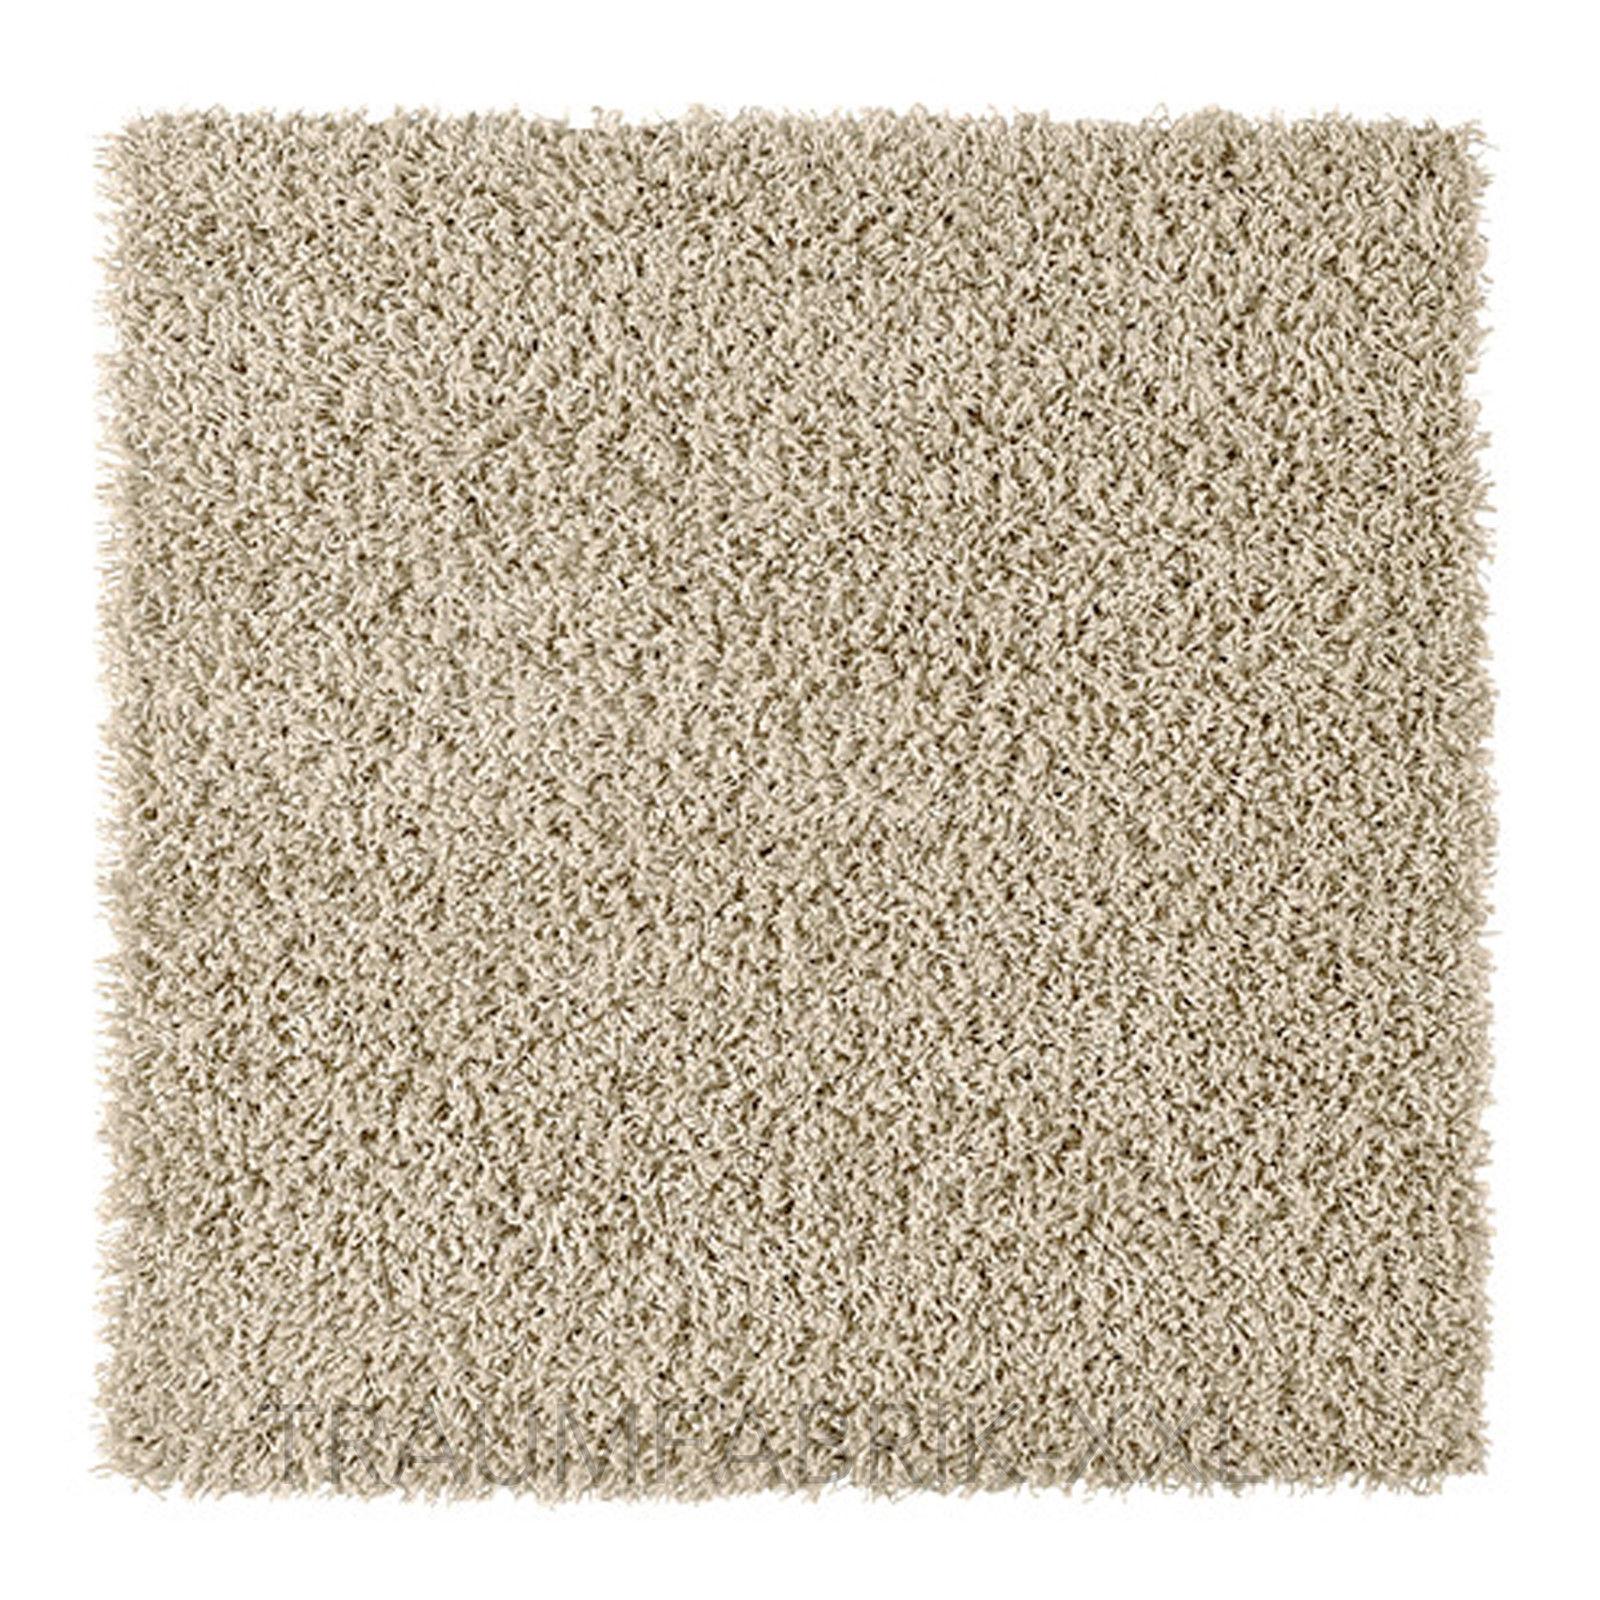 Ikea Teppich Beige Hampen Teppich Langflor 160x230 Cm